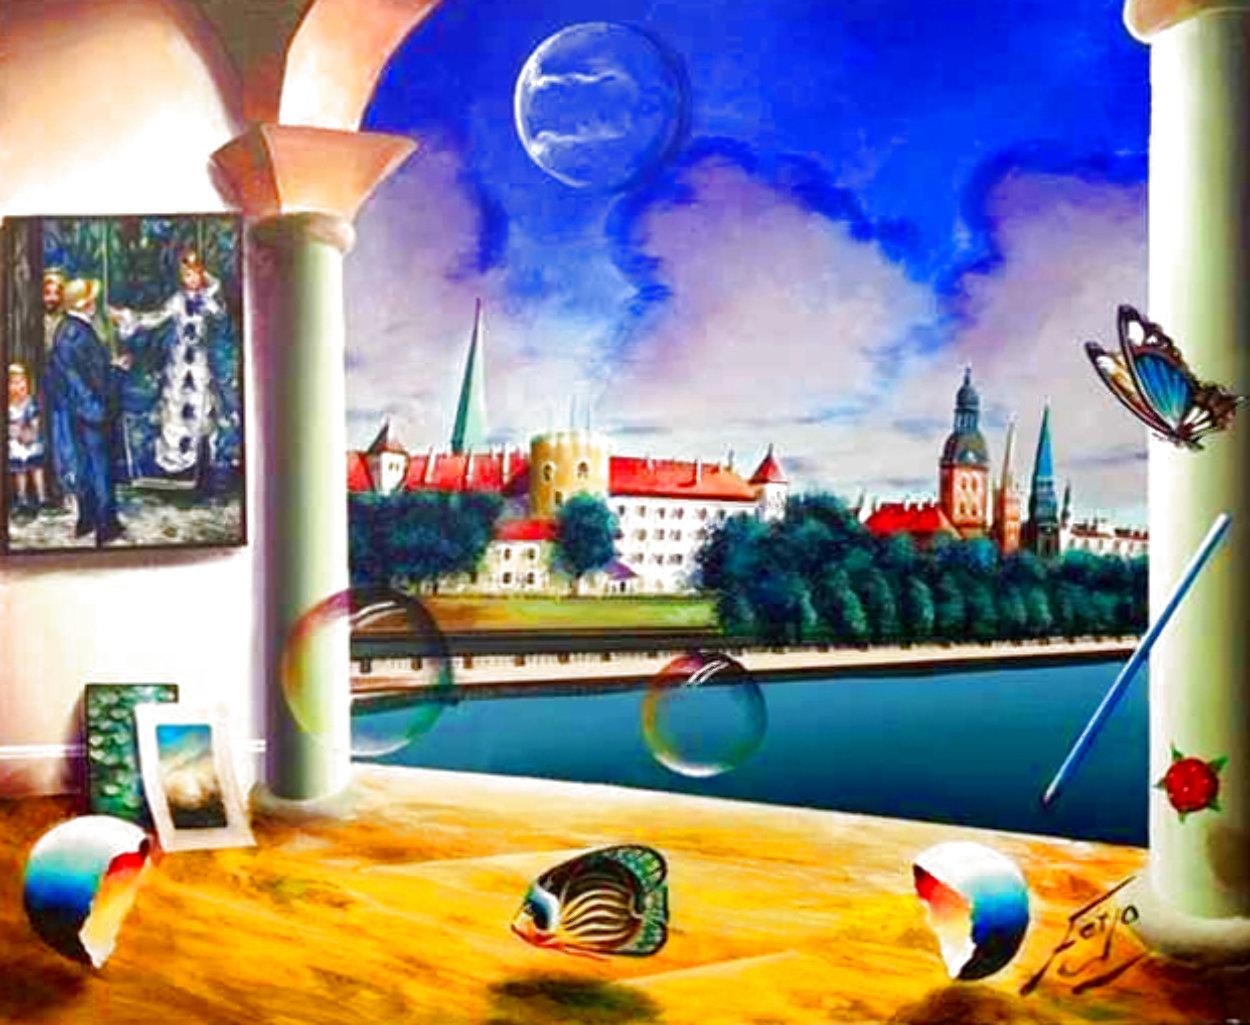 Peaceful Renoir 20x24 Original Painting by (Fernando de Jesus Oliviera) Ferjo